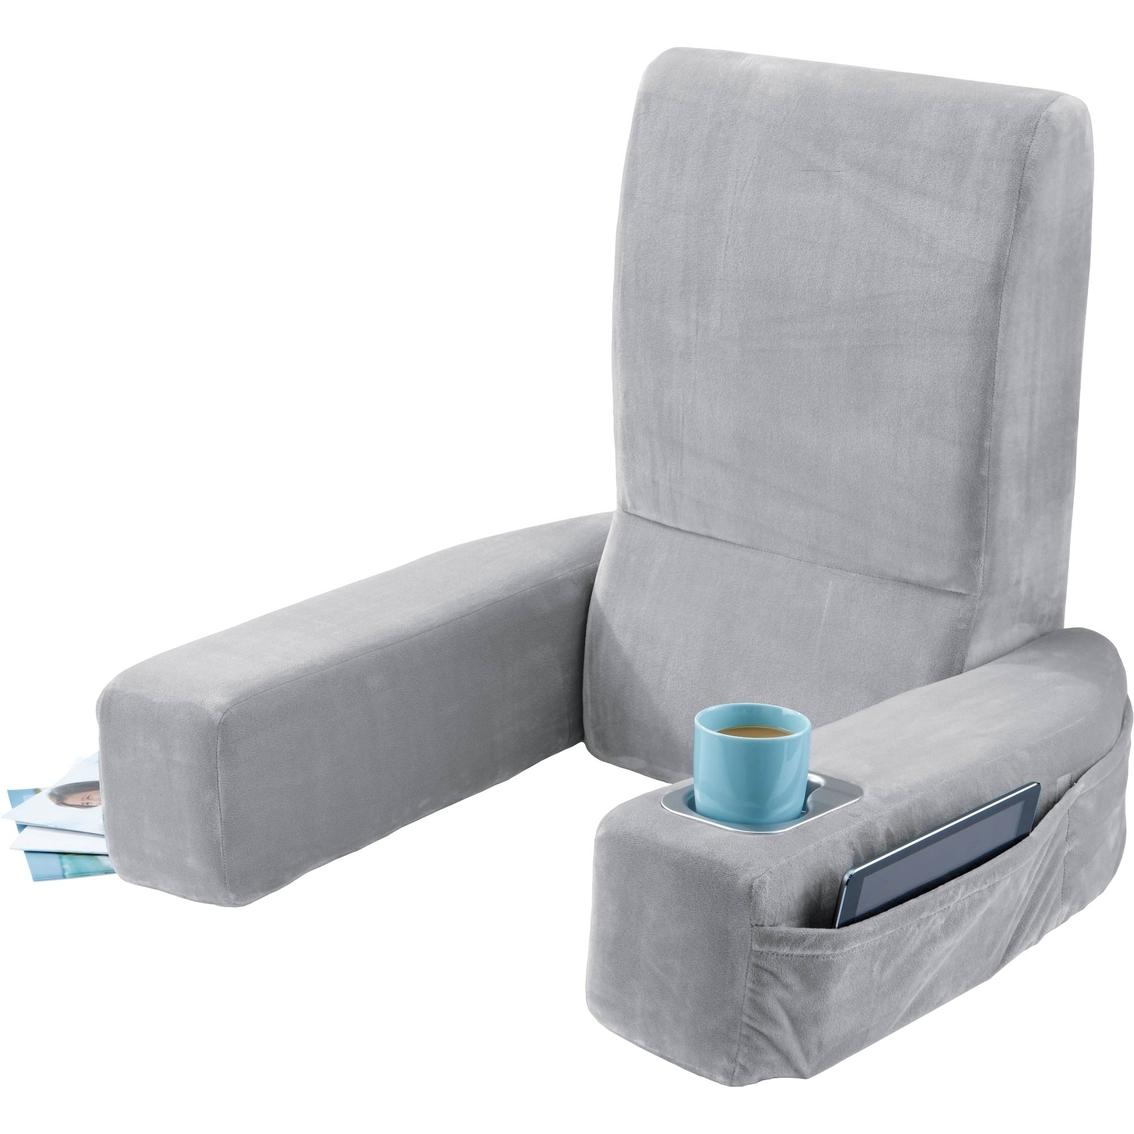 Brookstone Nap Bed Rest  sc 1 st  ShopMyExchange.com & Brookstone Nap Bed Rest | Bed Pillows | Home u0026 Appliances | Shop The ...